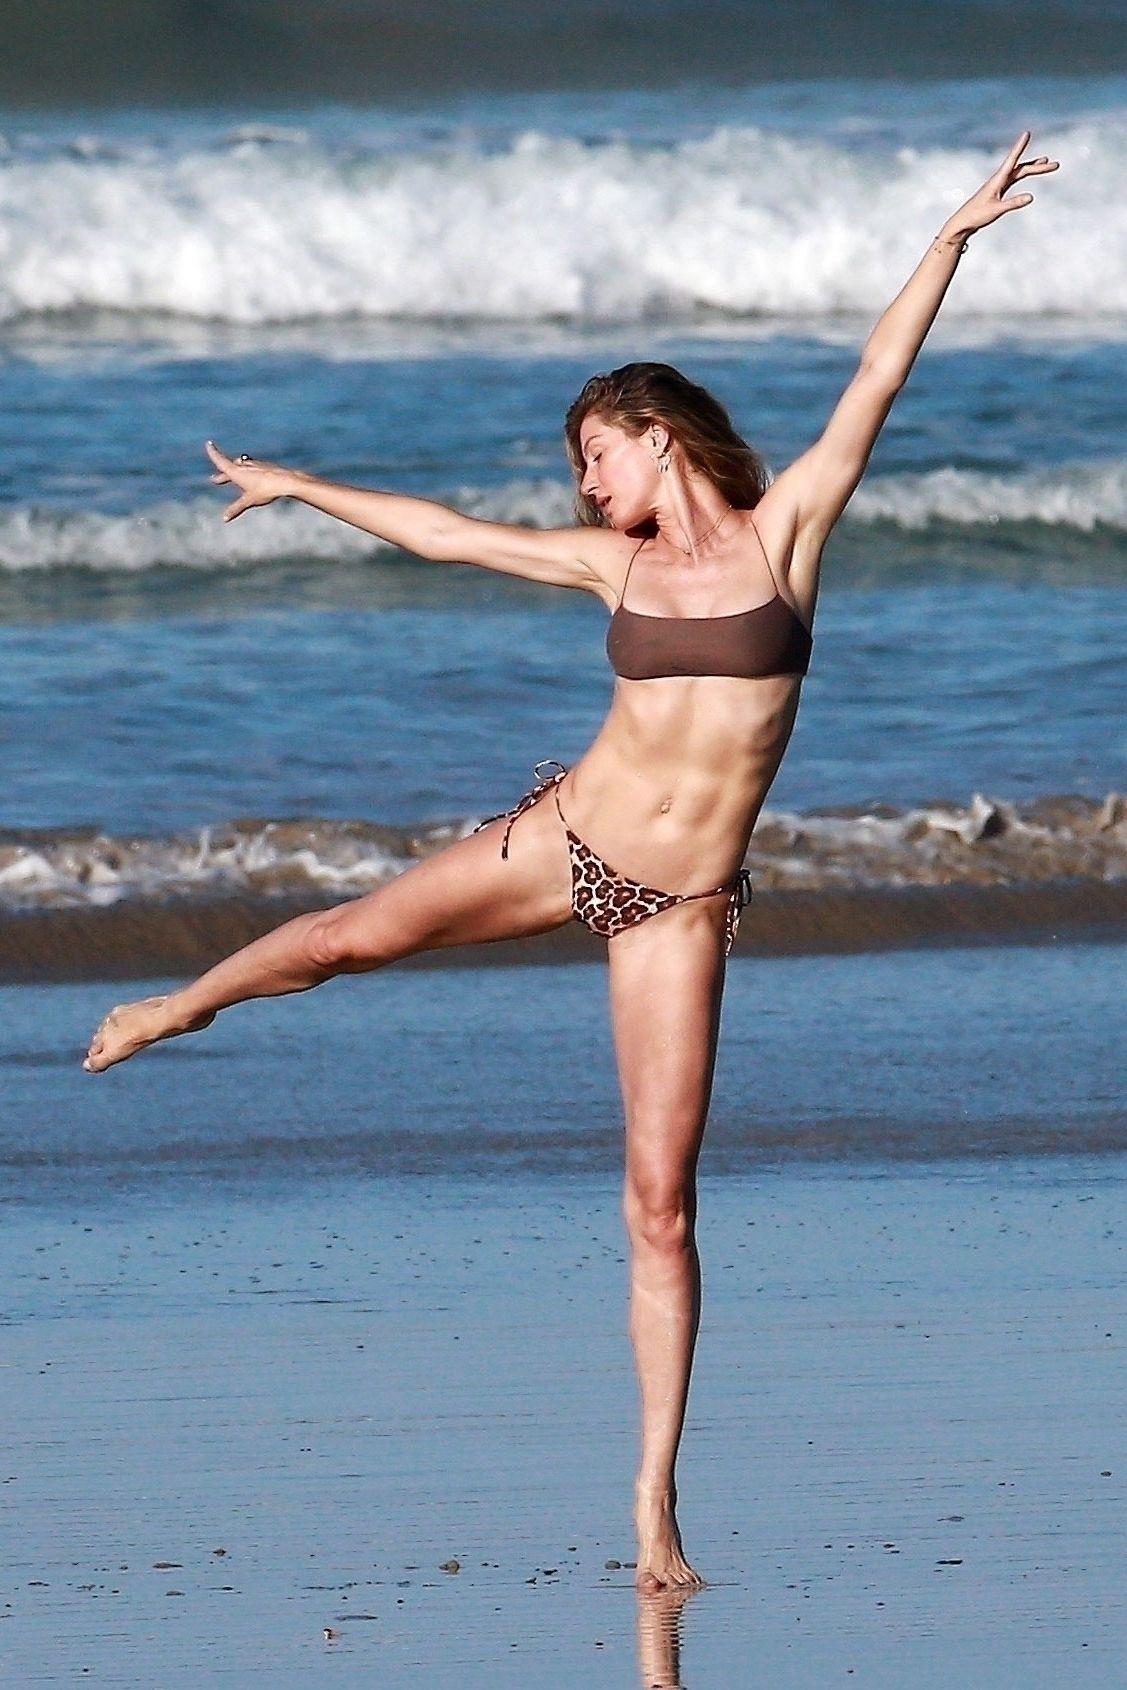 Gisele Bundchen Puts Her Incredible Bikini Body On Display During A Beach Photoshoot 0004